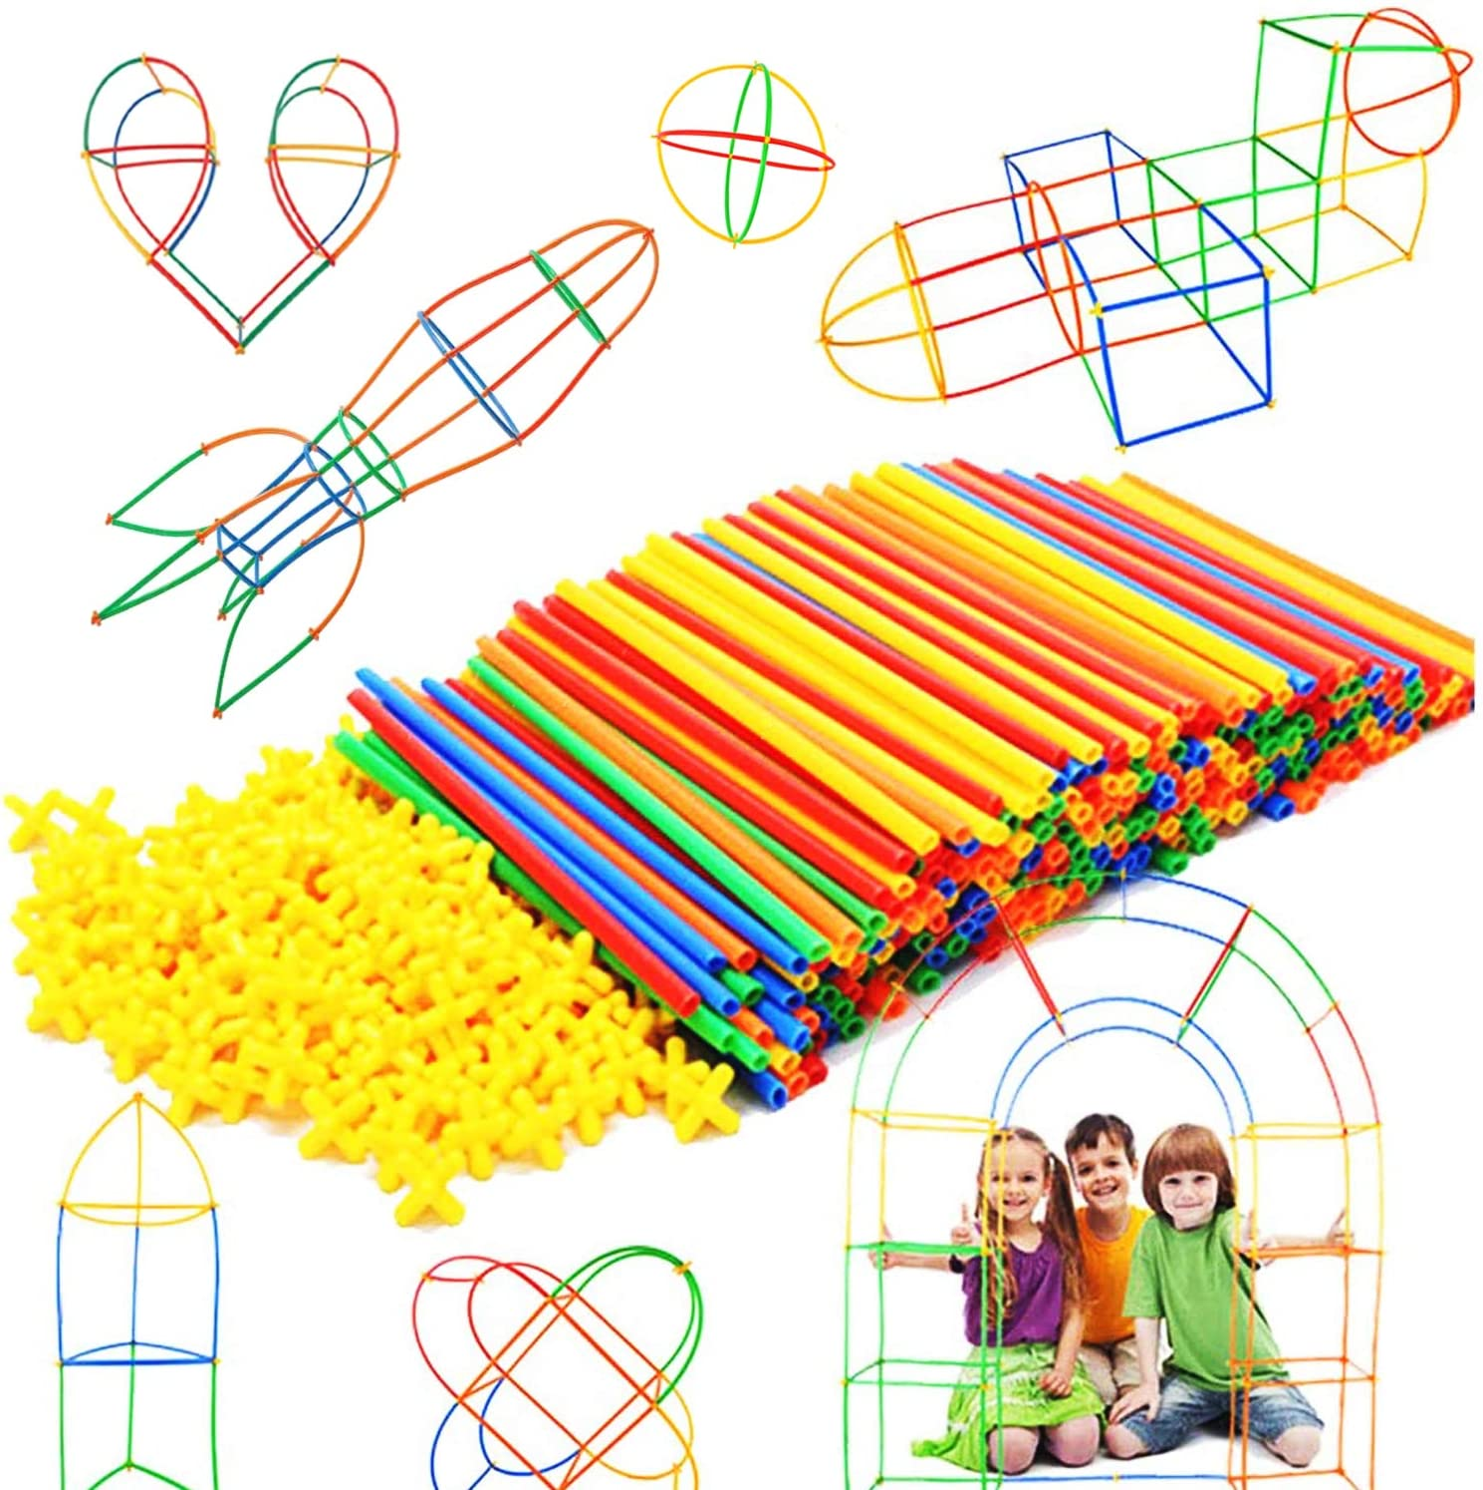 RAINBOW TOYFROG 300 pcs STEM Building Toys $14.44 Coupon